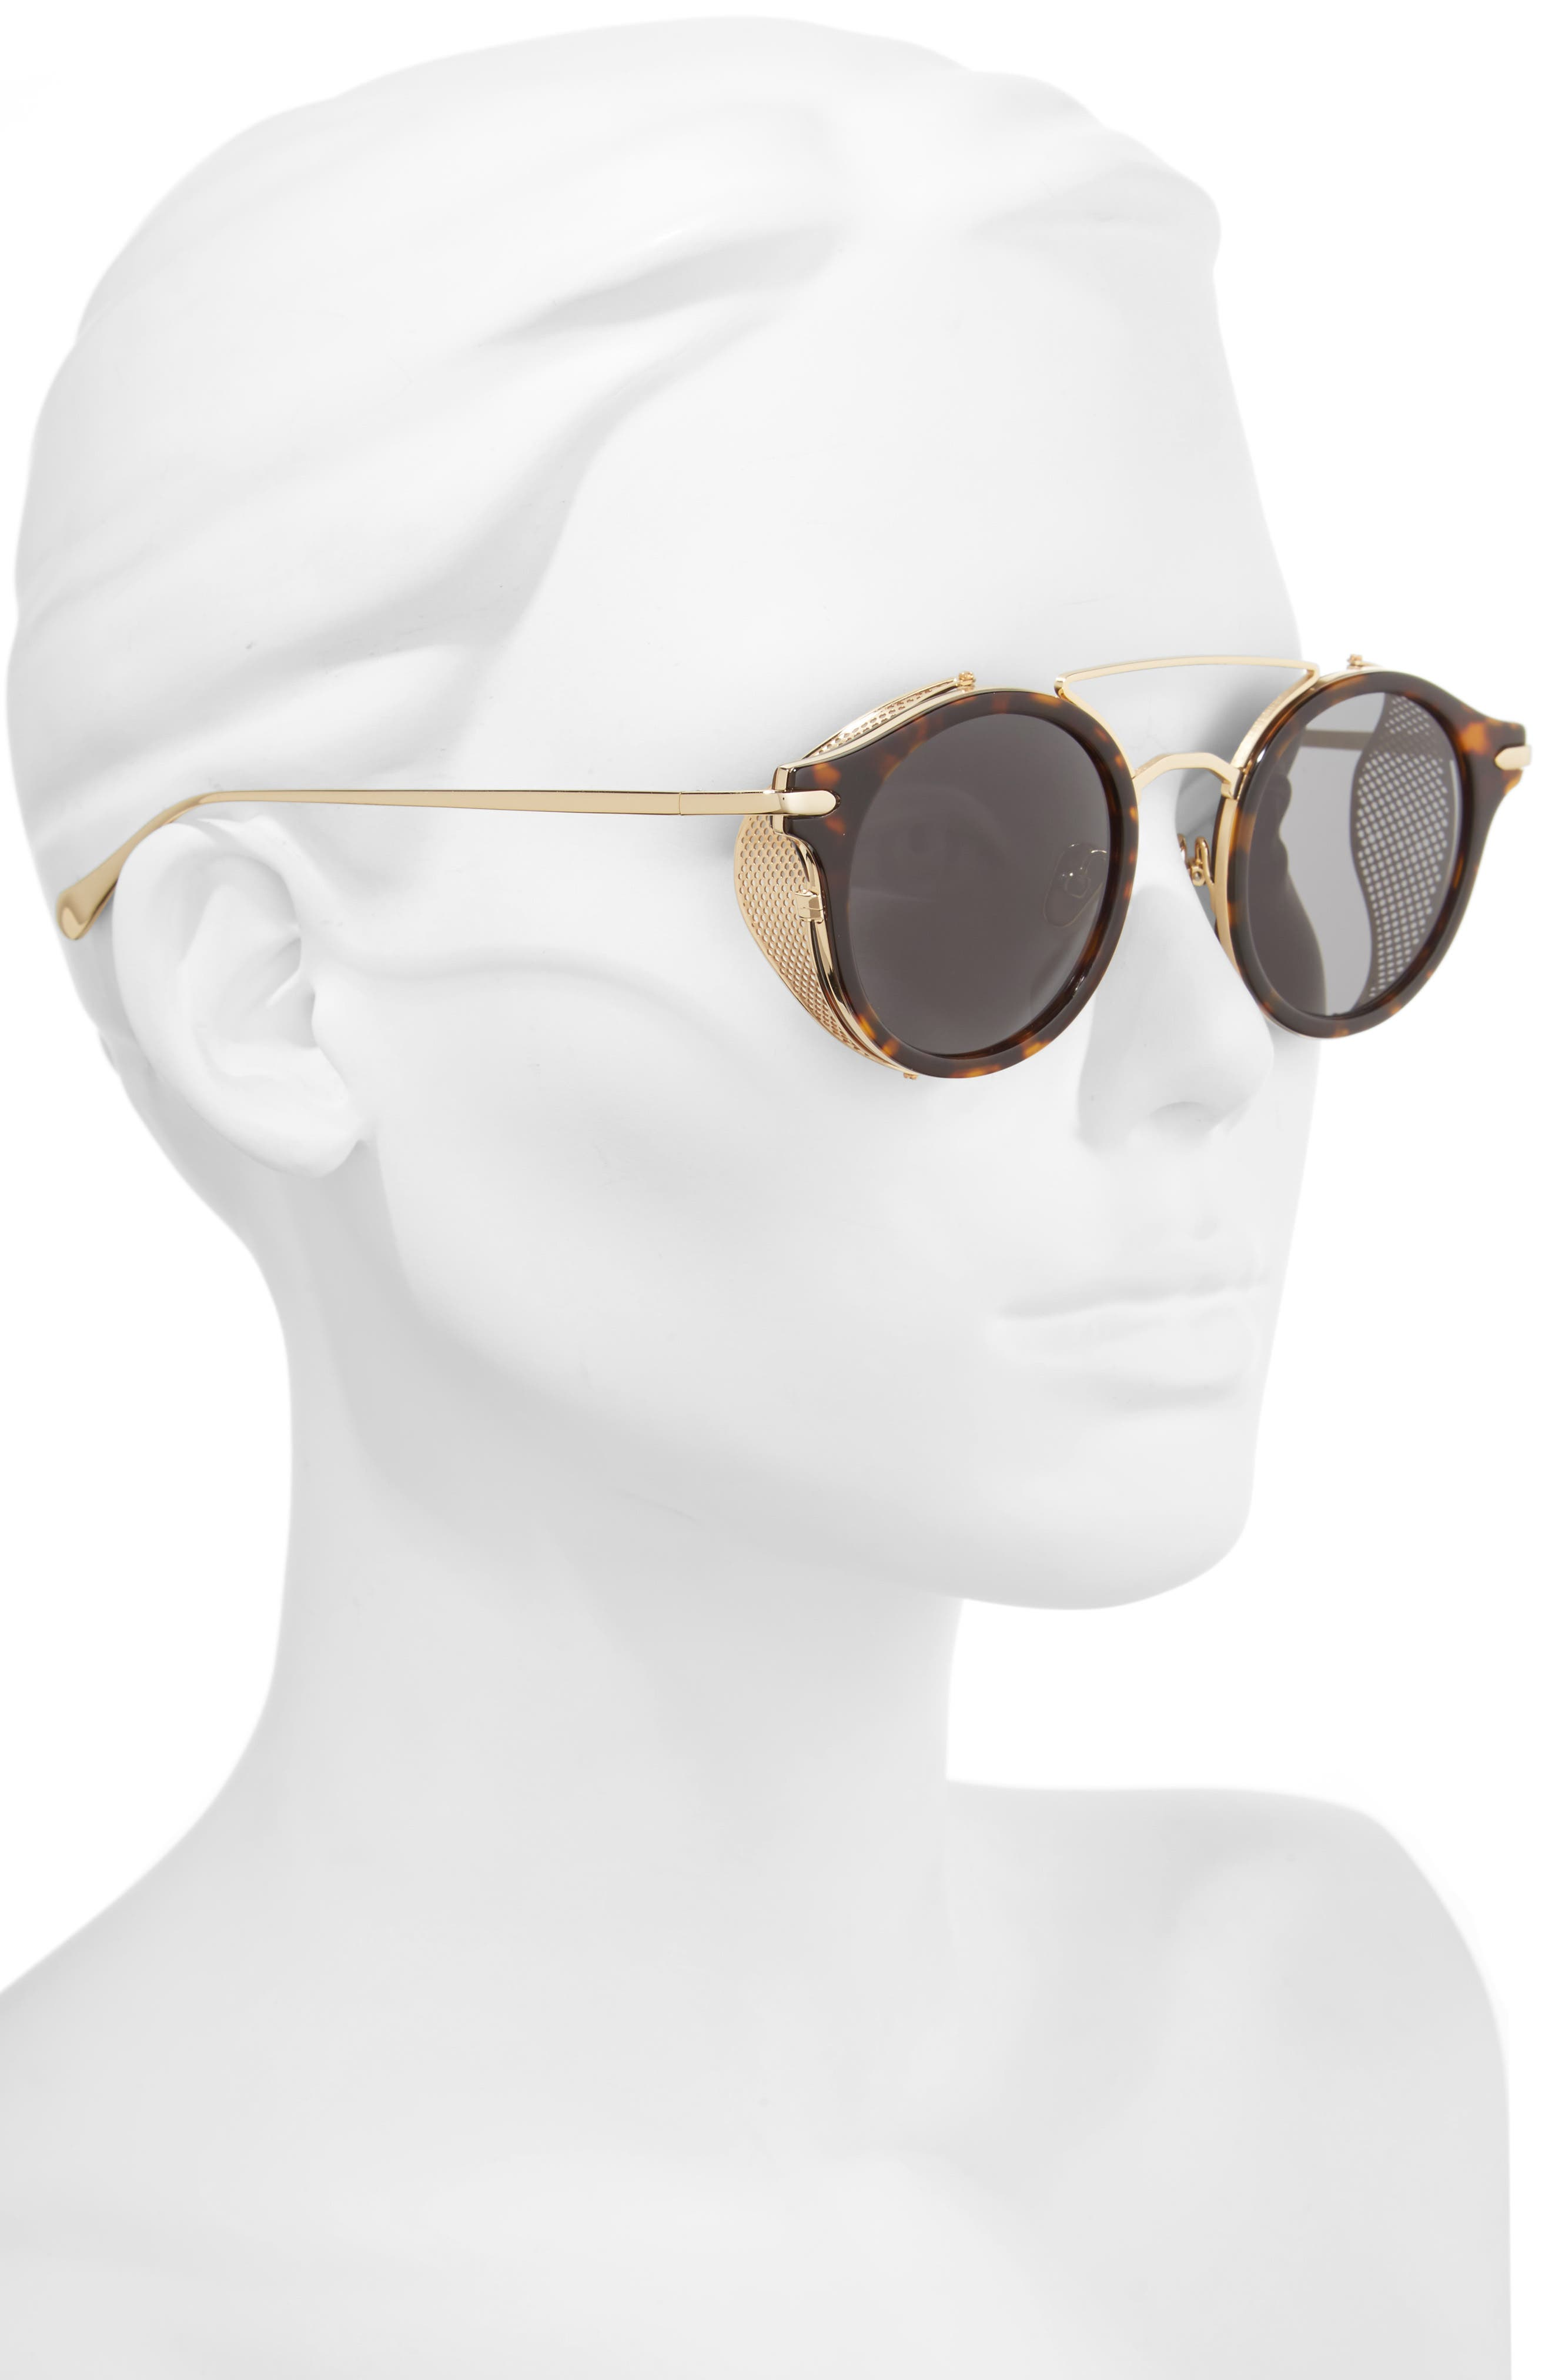 Mile High 47mm Sunglasses,                             Alternate thumbnail 5, color,